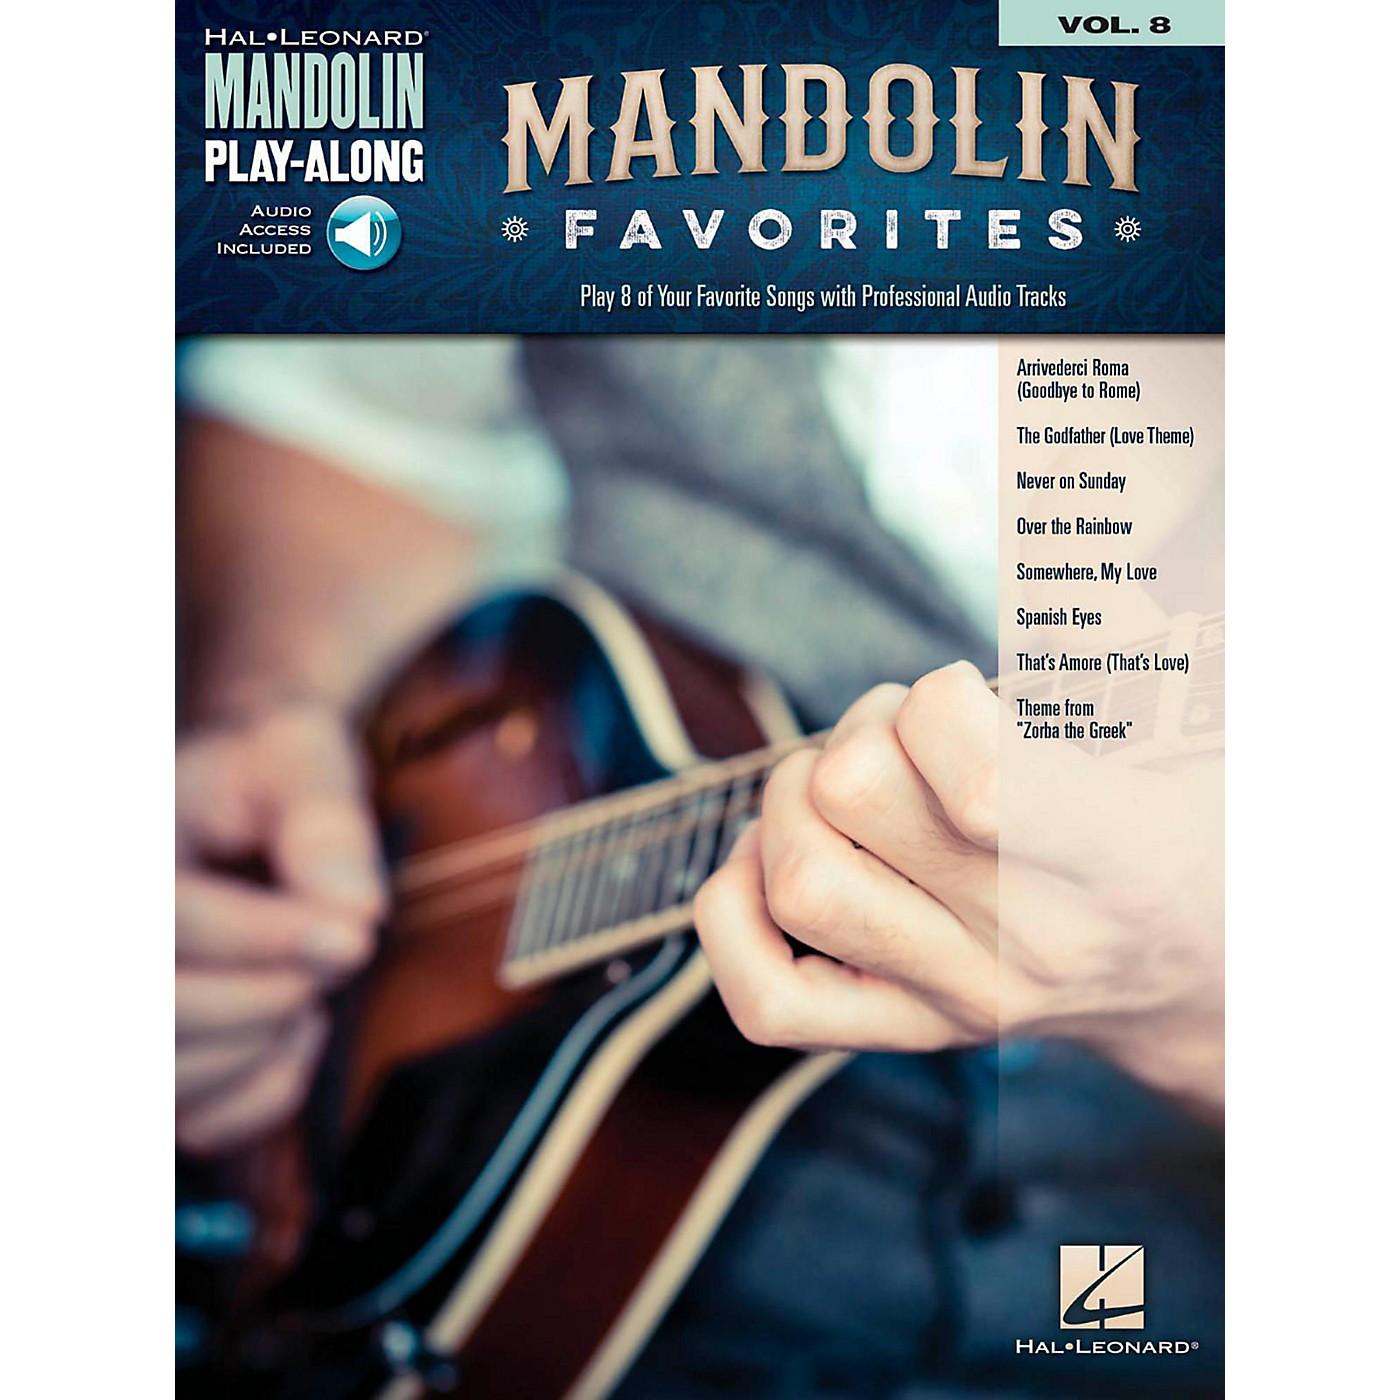 Hal Leonard Mandolin Favorites - Mandolin Play-Along Vol. 8 Book/Audio Online thumbnail